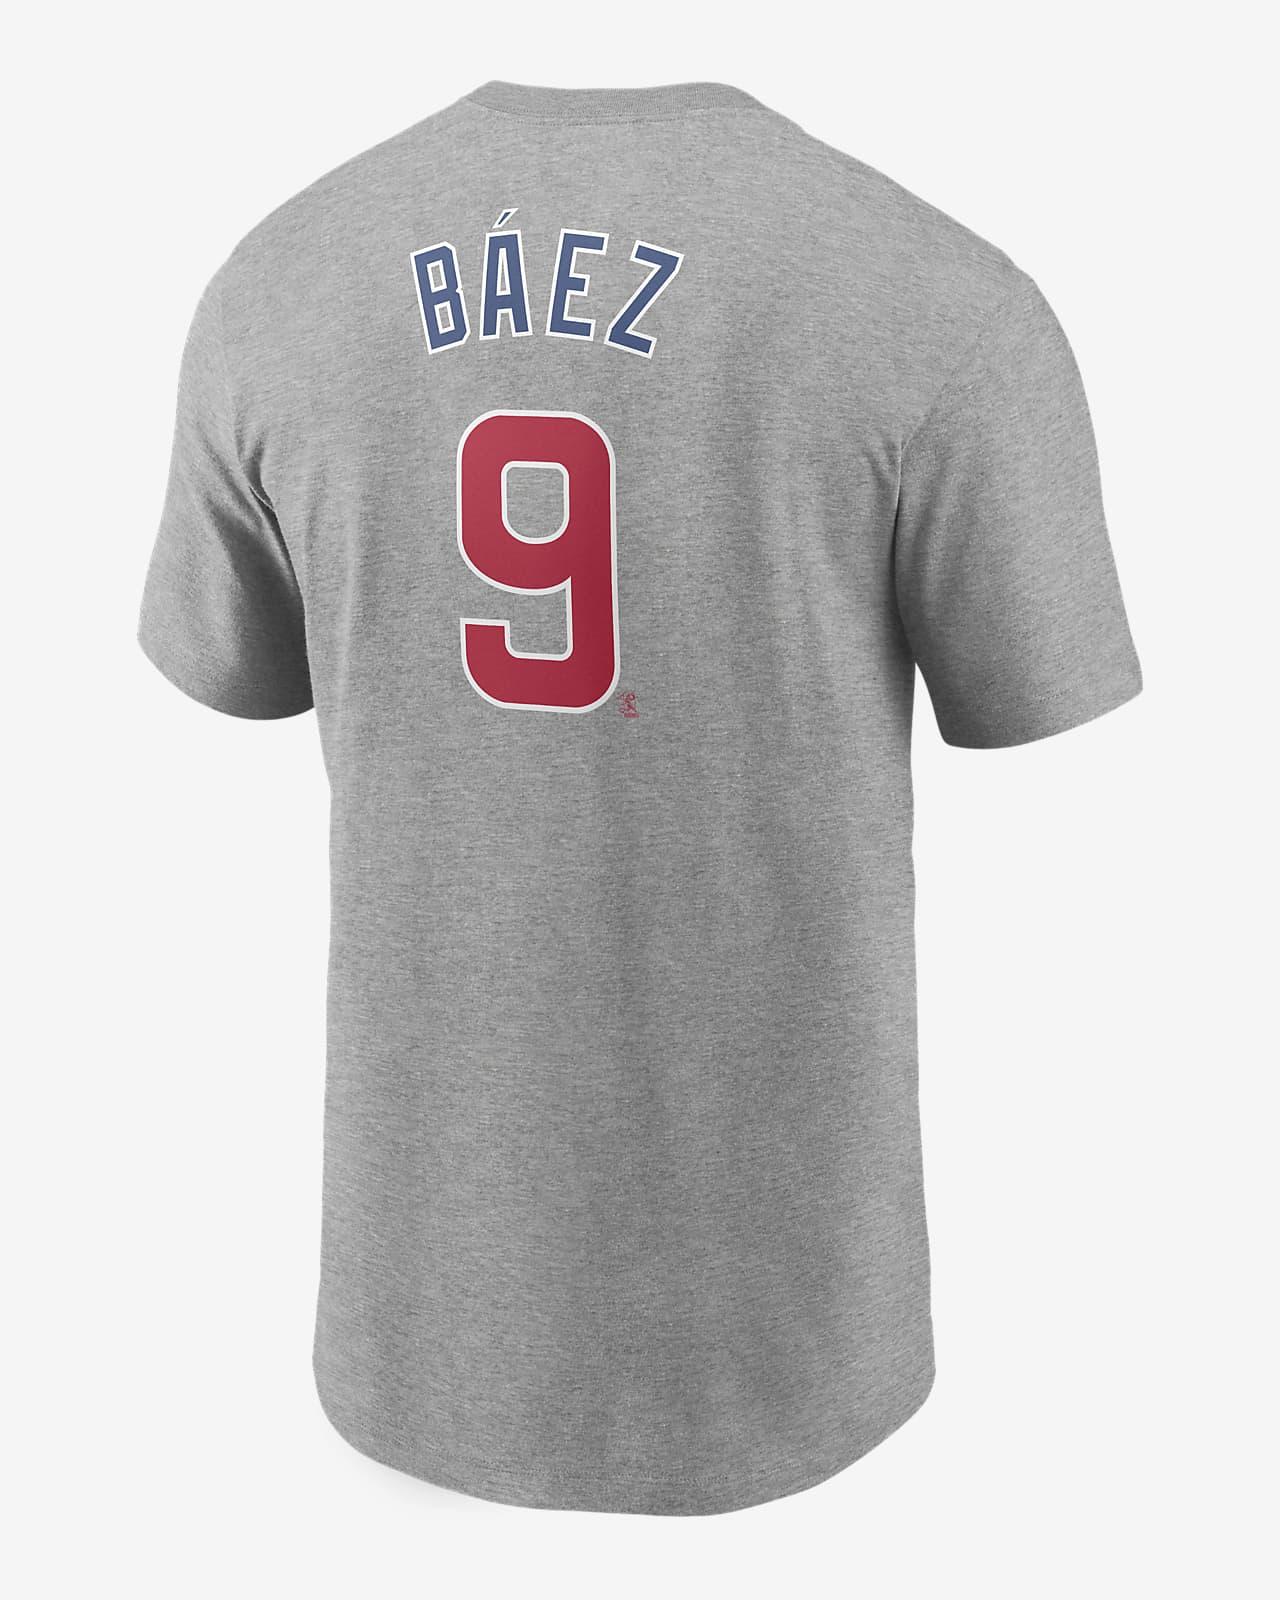 MLB Chicago Cubs (Javier Baez) Men's T-Shirt